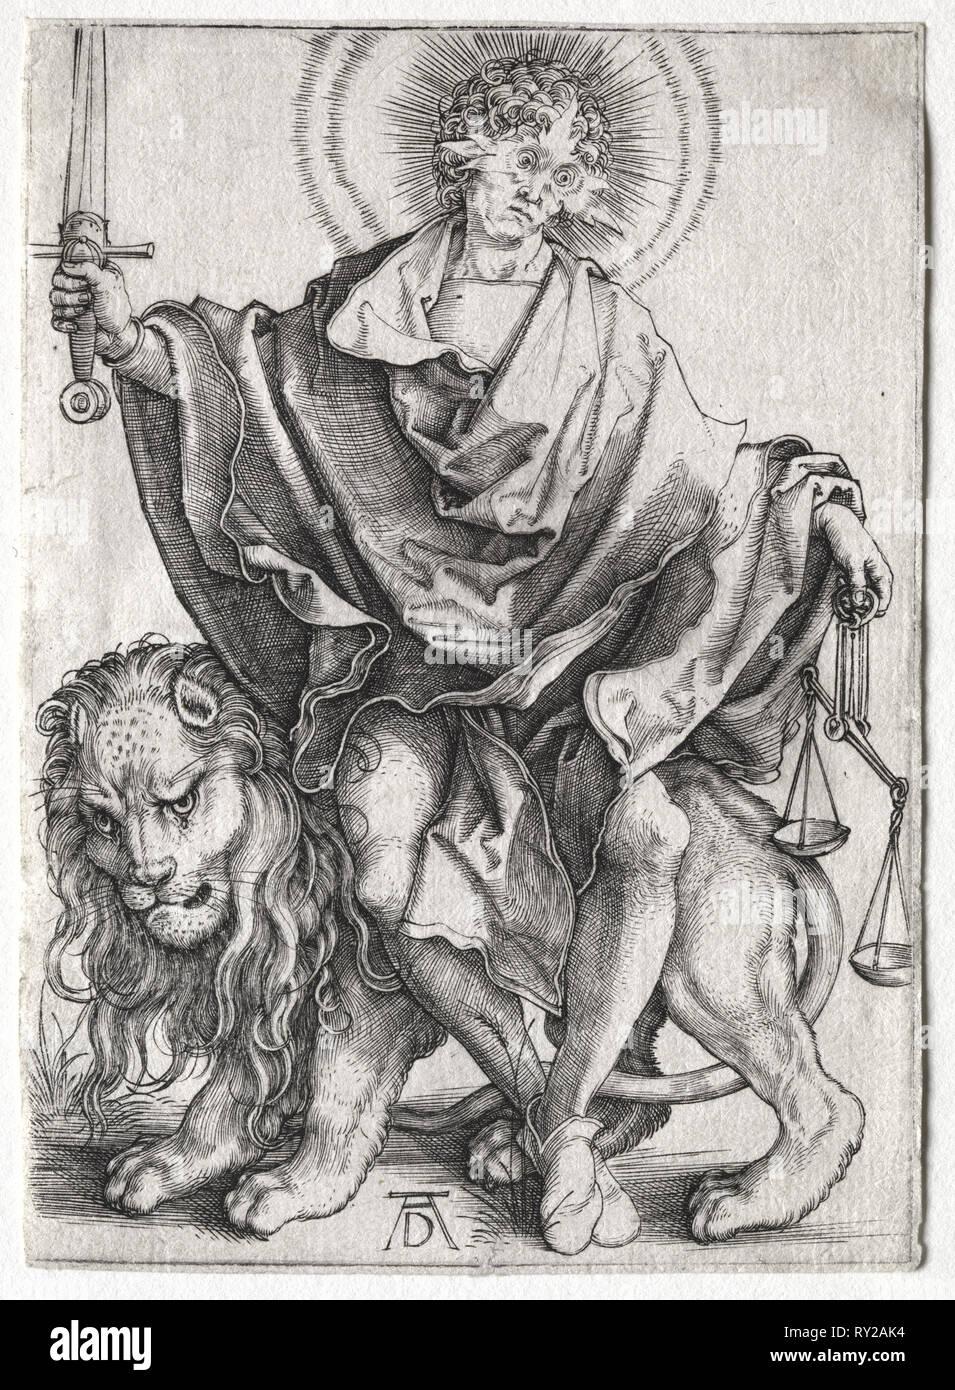 Son of Righteousness, c. 1500. Albrecht Dürer (German, 1471-1528). Engraving - Stock Image